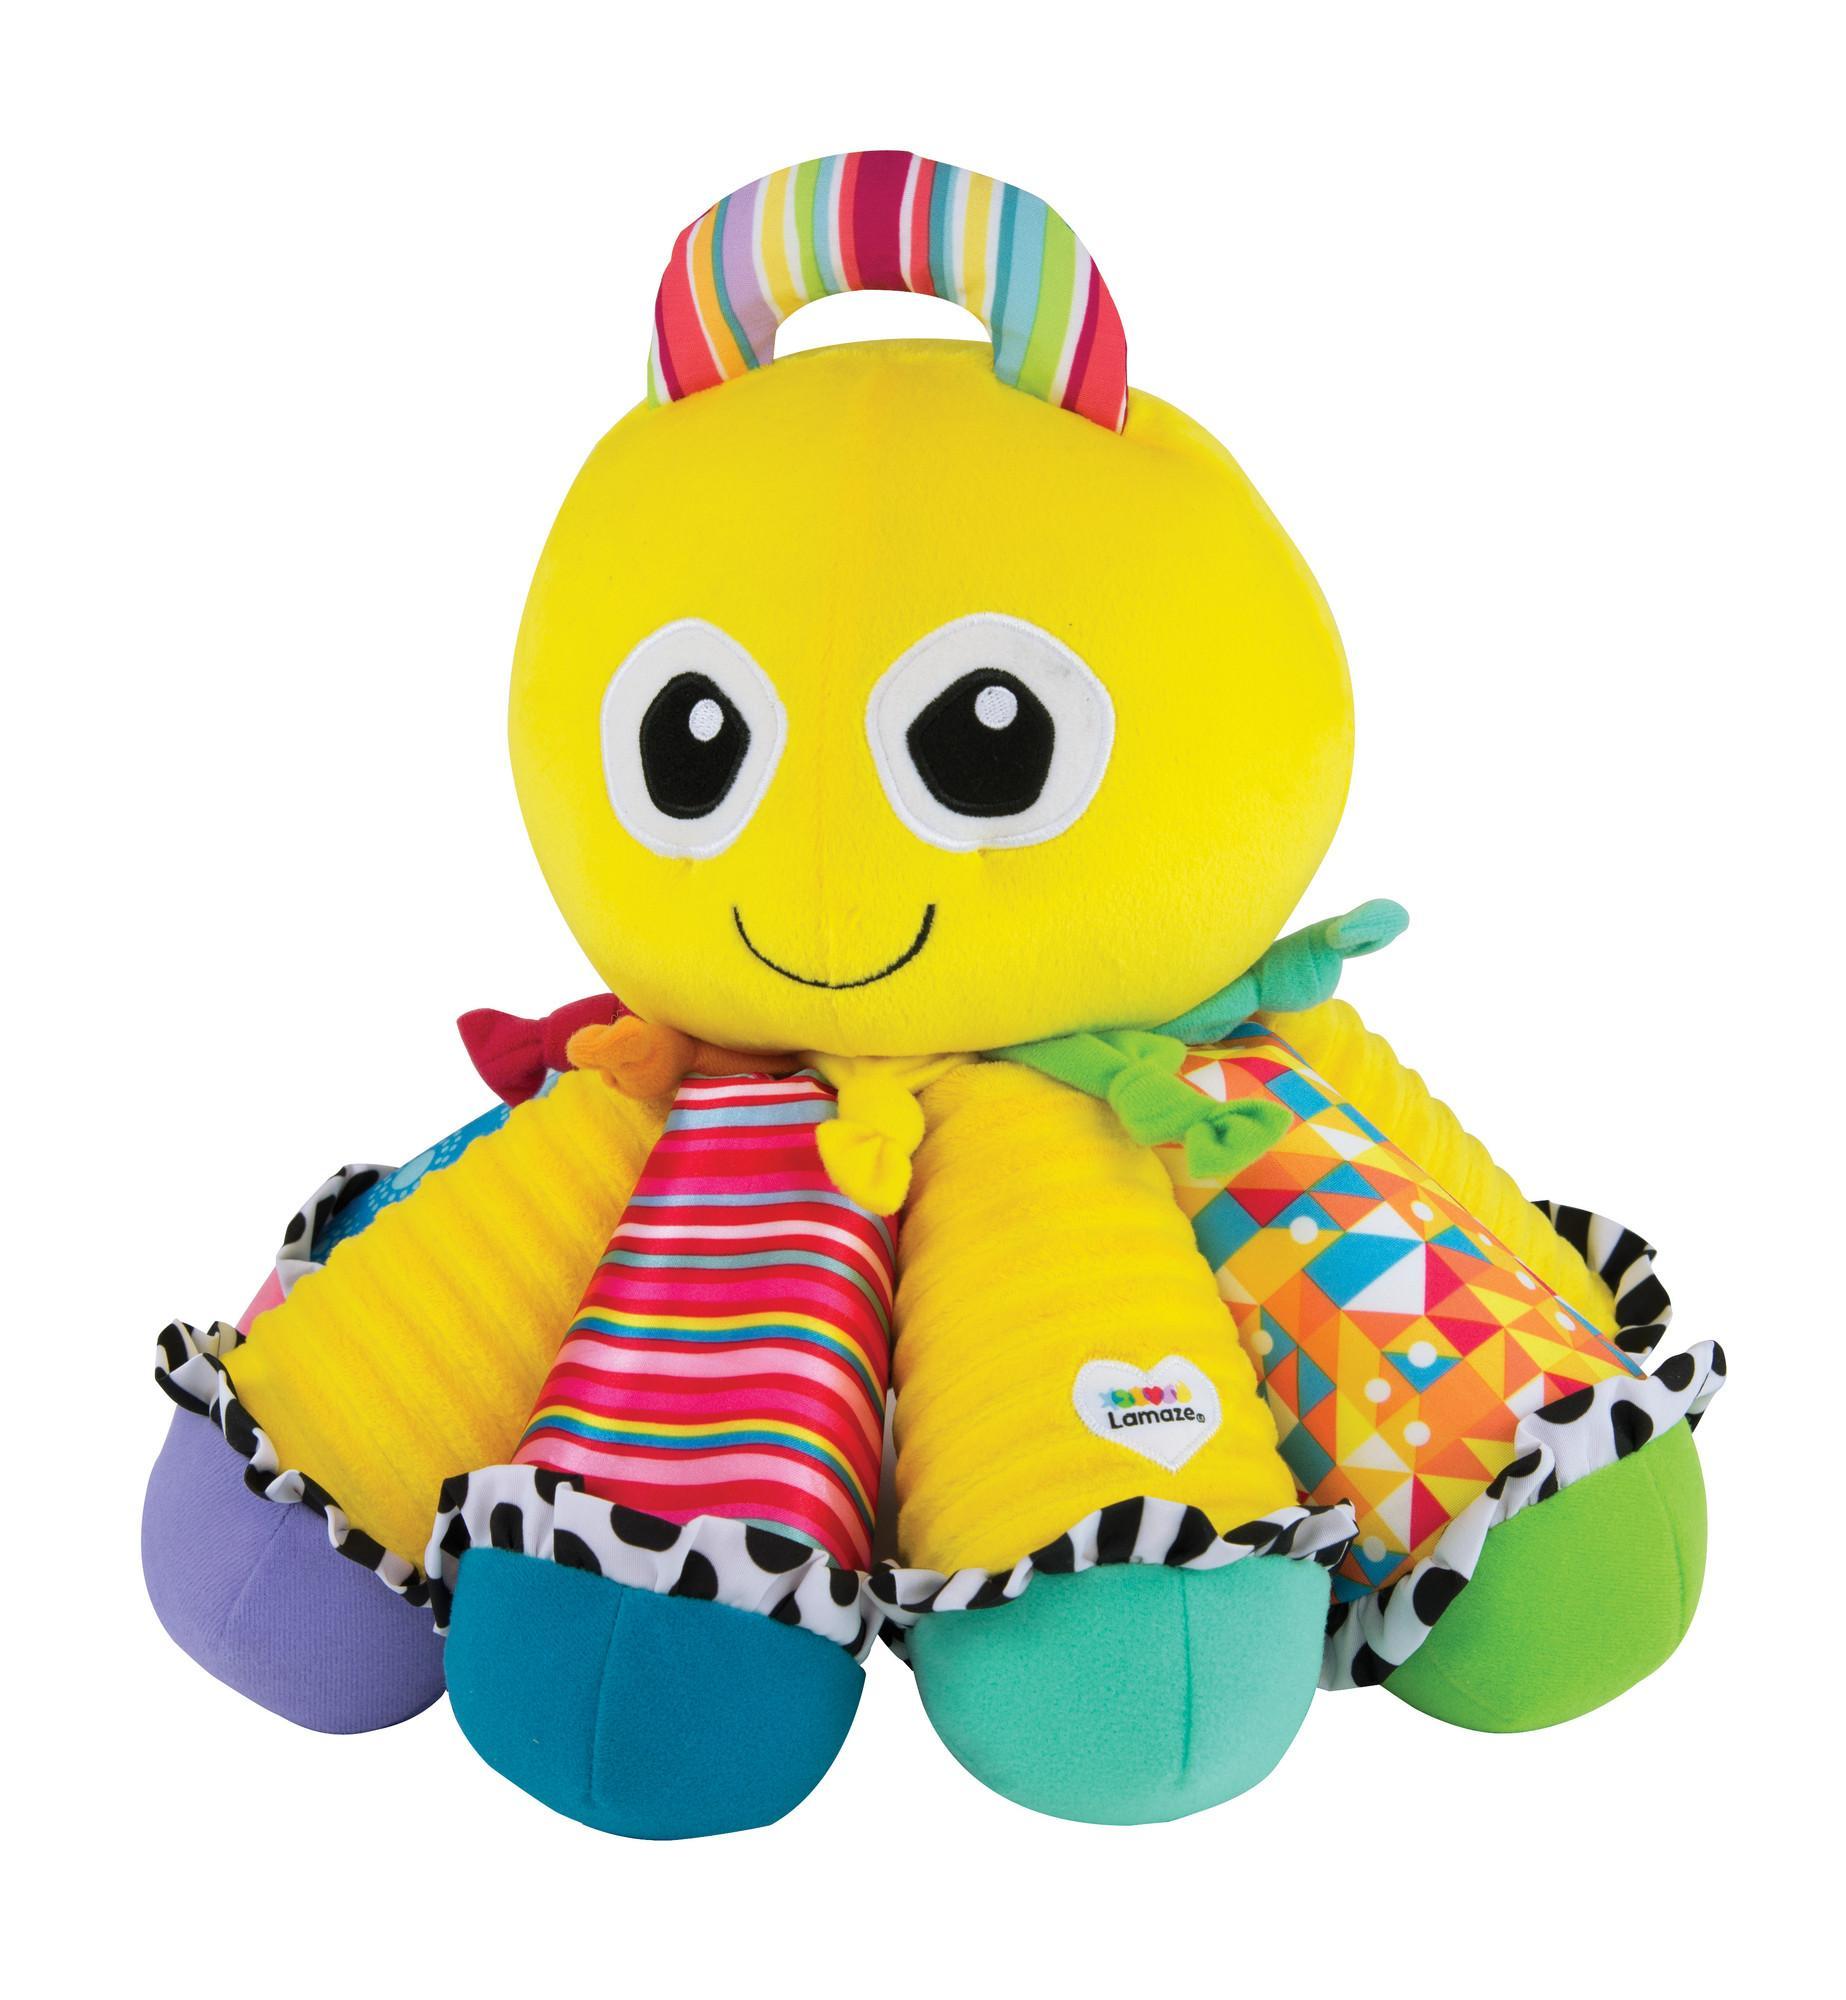 Amazon.com : Lamaze Octotunes : Plush Animal Toys : Baby